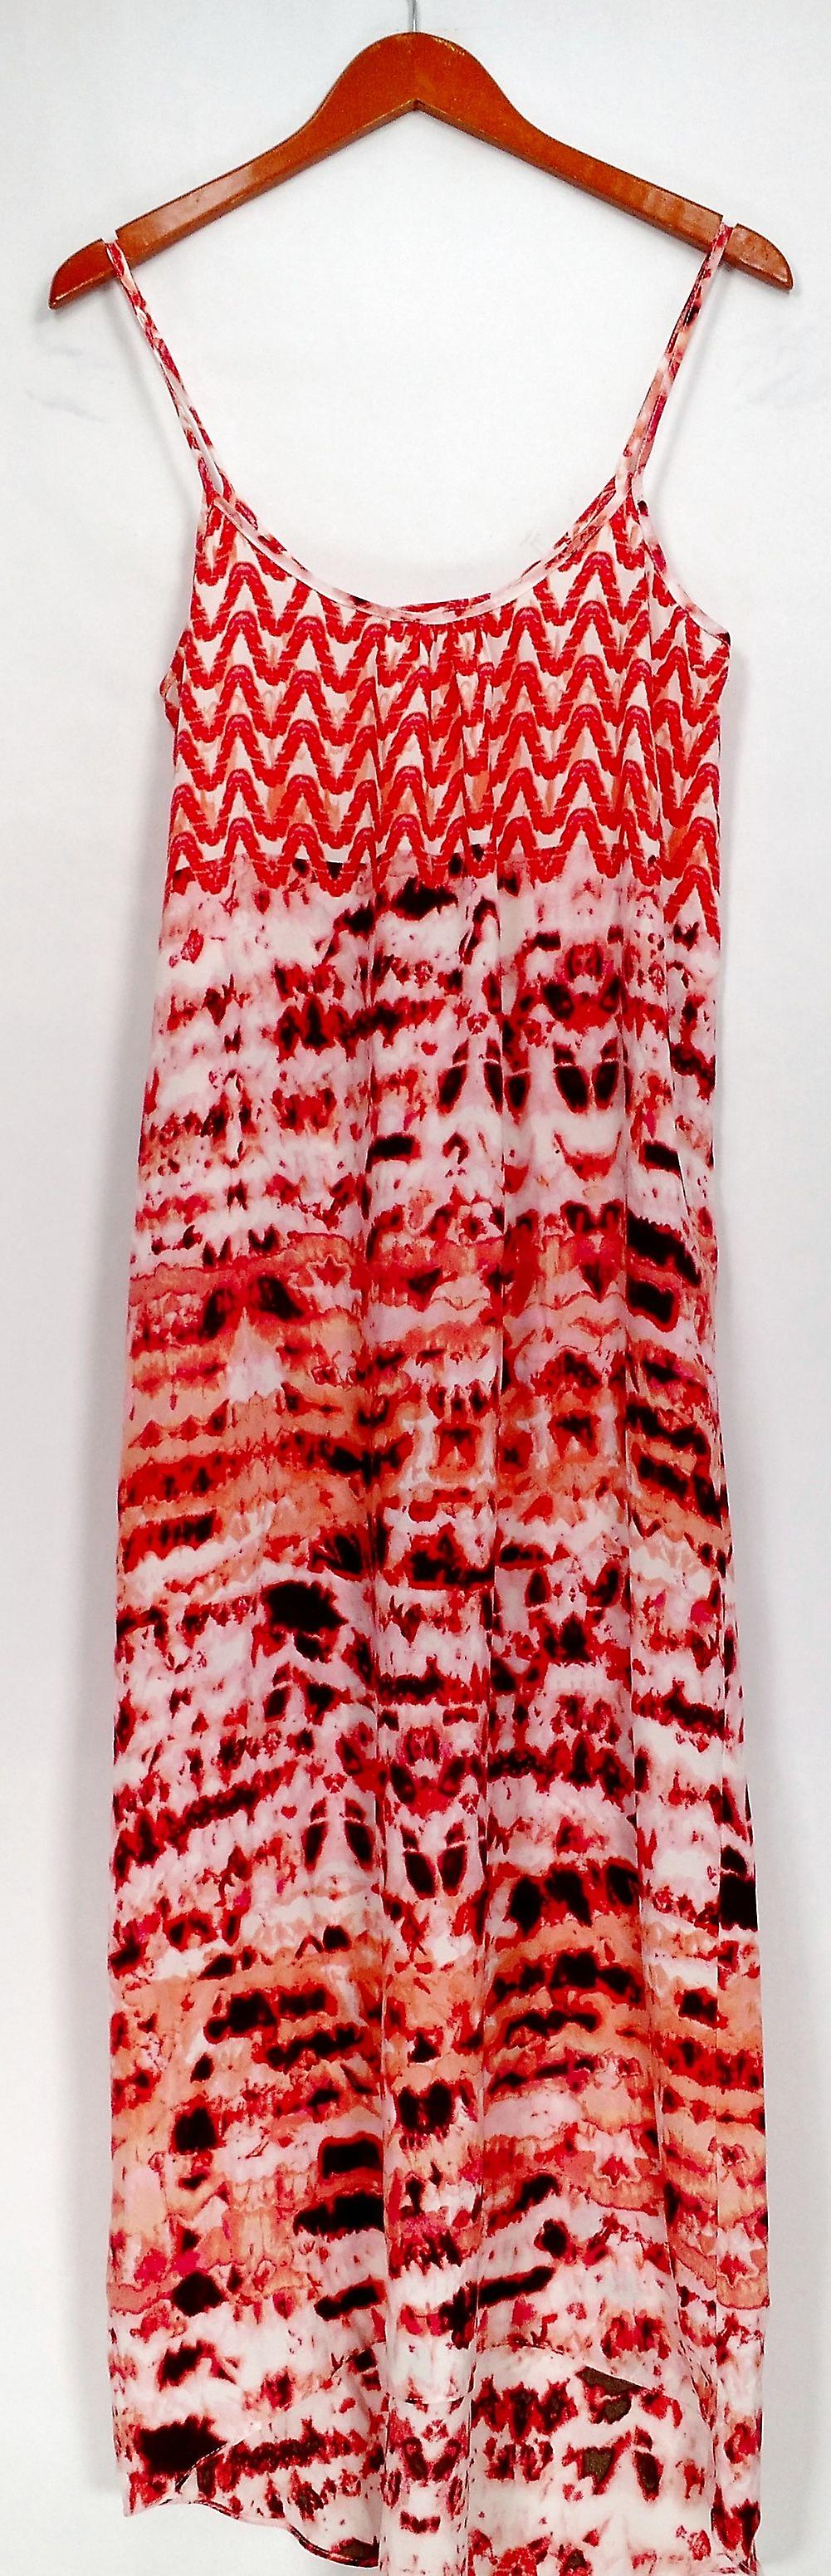 Love Ady Dress Printed Spaghetti Strap Maxi w/ Hi Low Hemline Pink